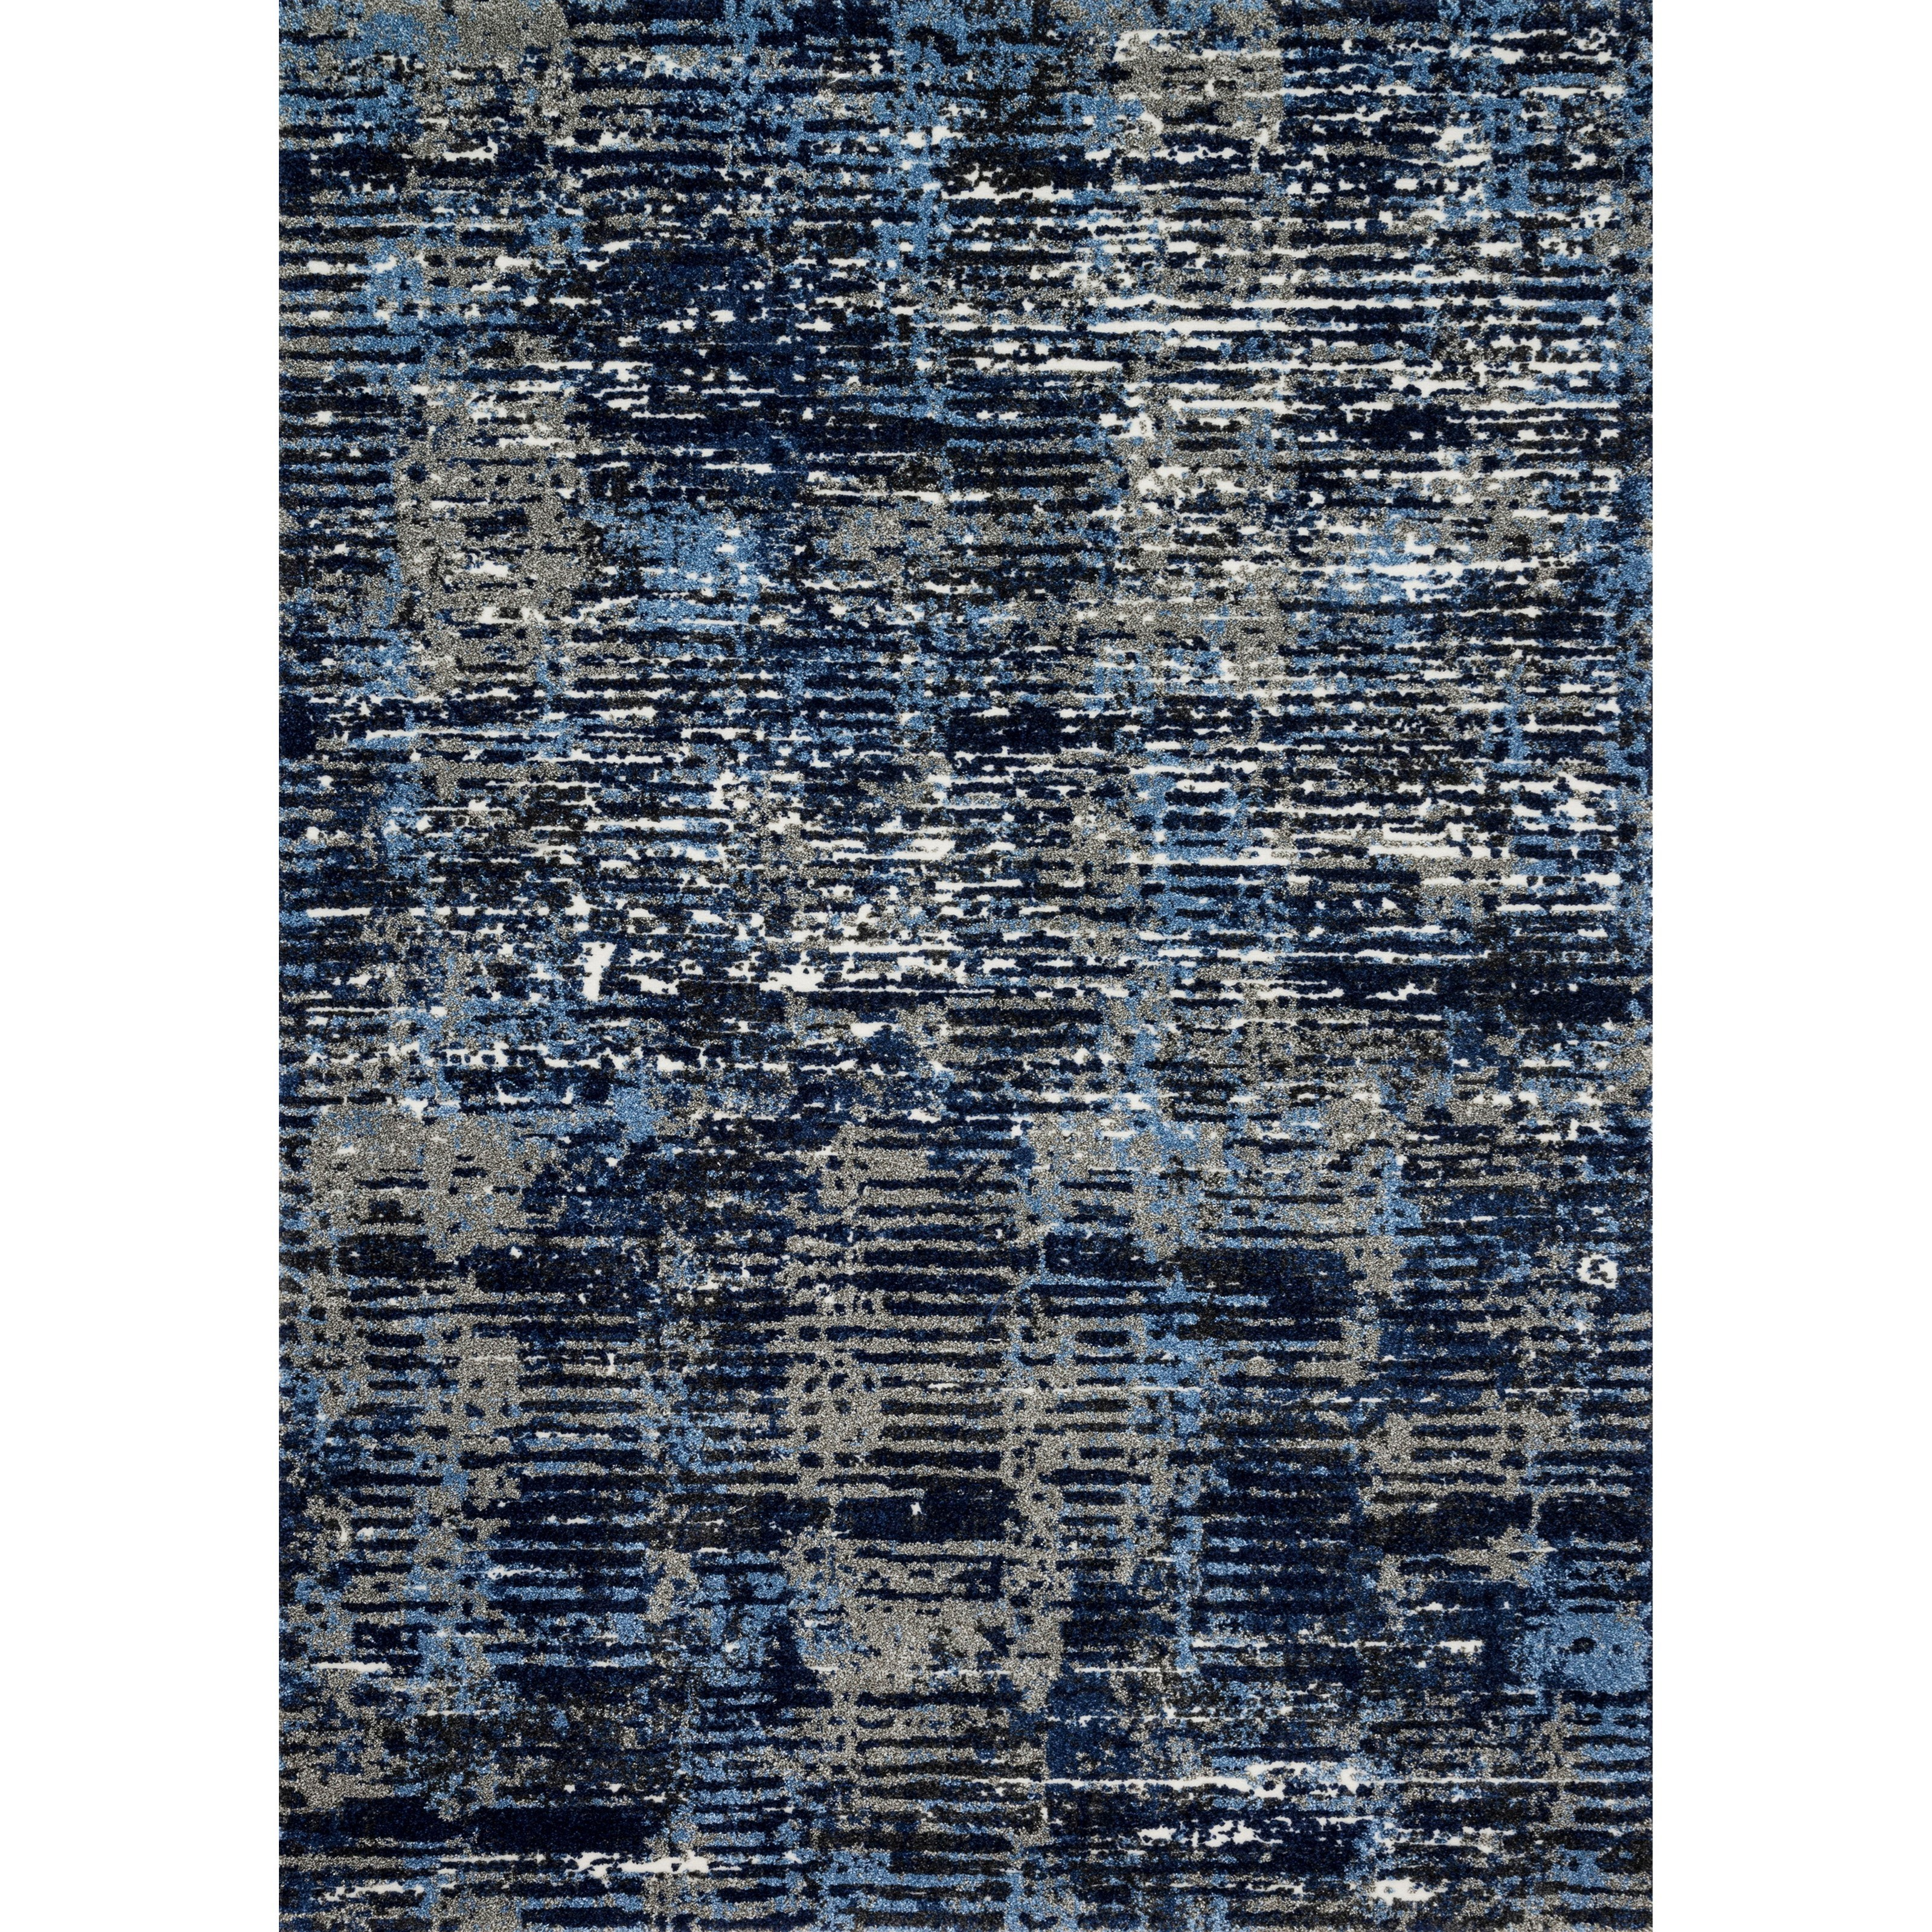 "Viera 1'6"" x 1'6""  Dark Blue / Grey Rug by Loloi Rugs at Pedigo Furniture"